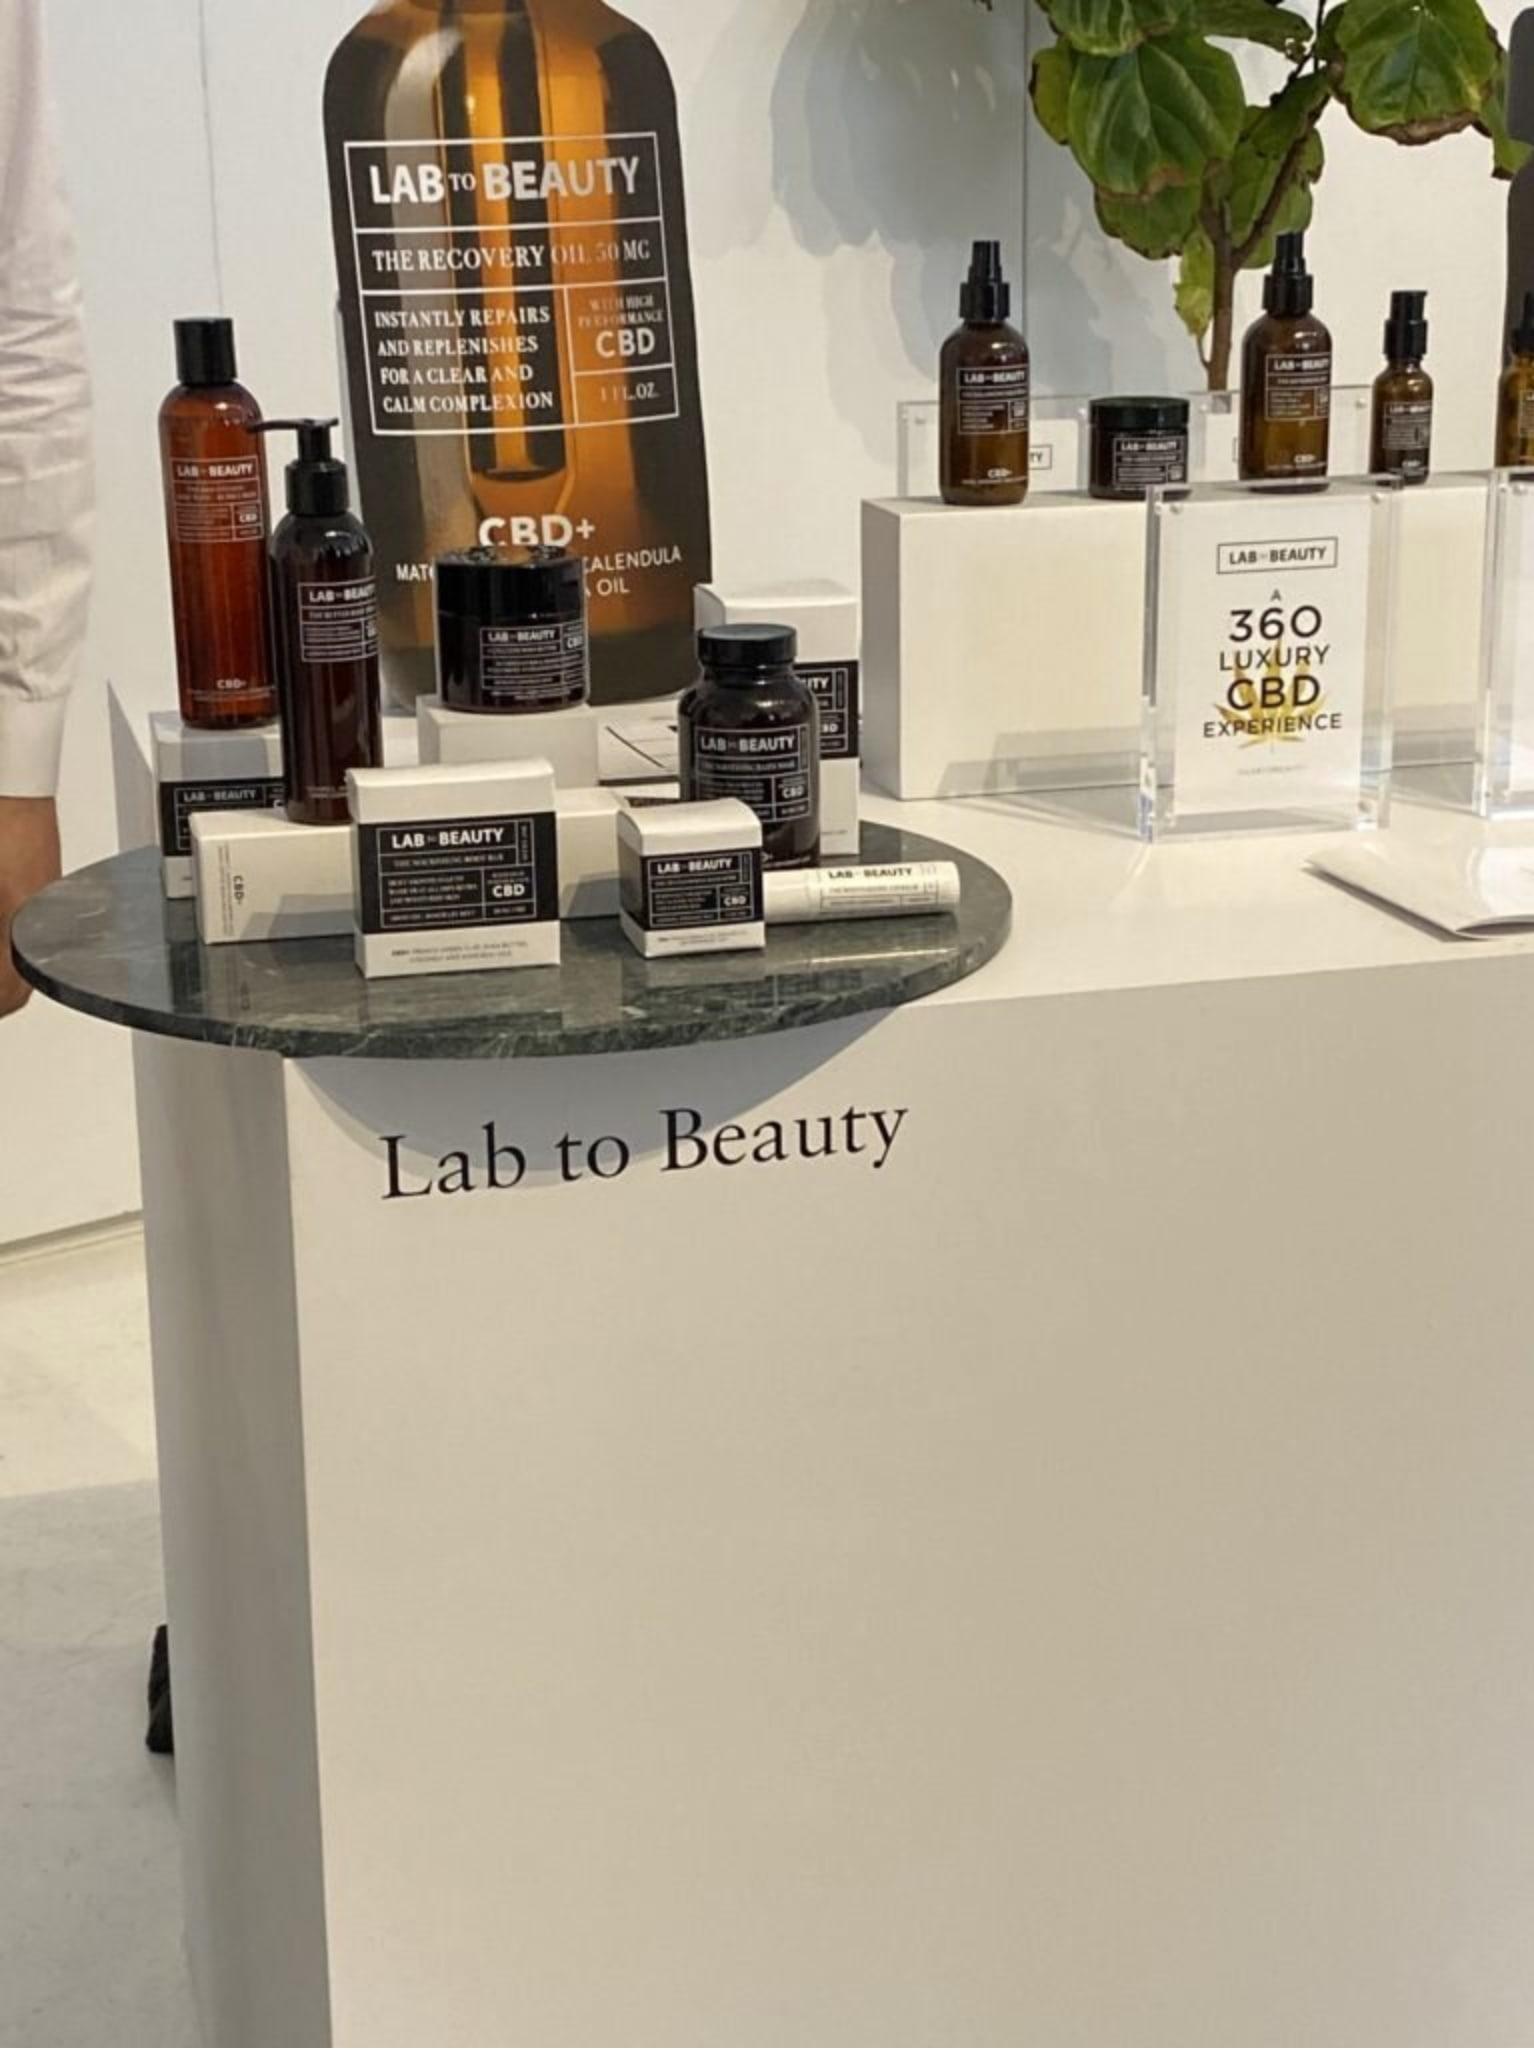 lab-to-beauty-display-at-lmcc